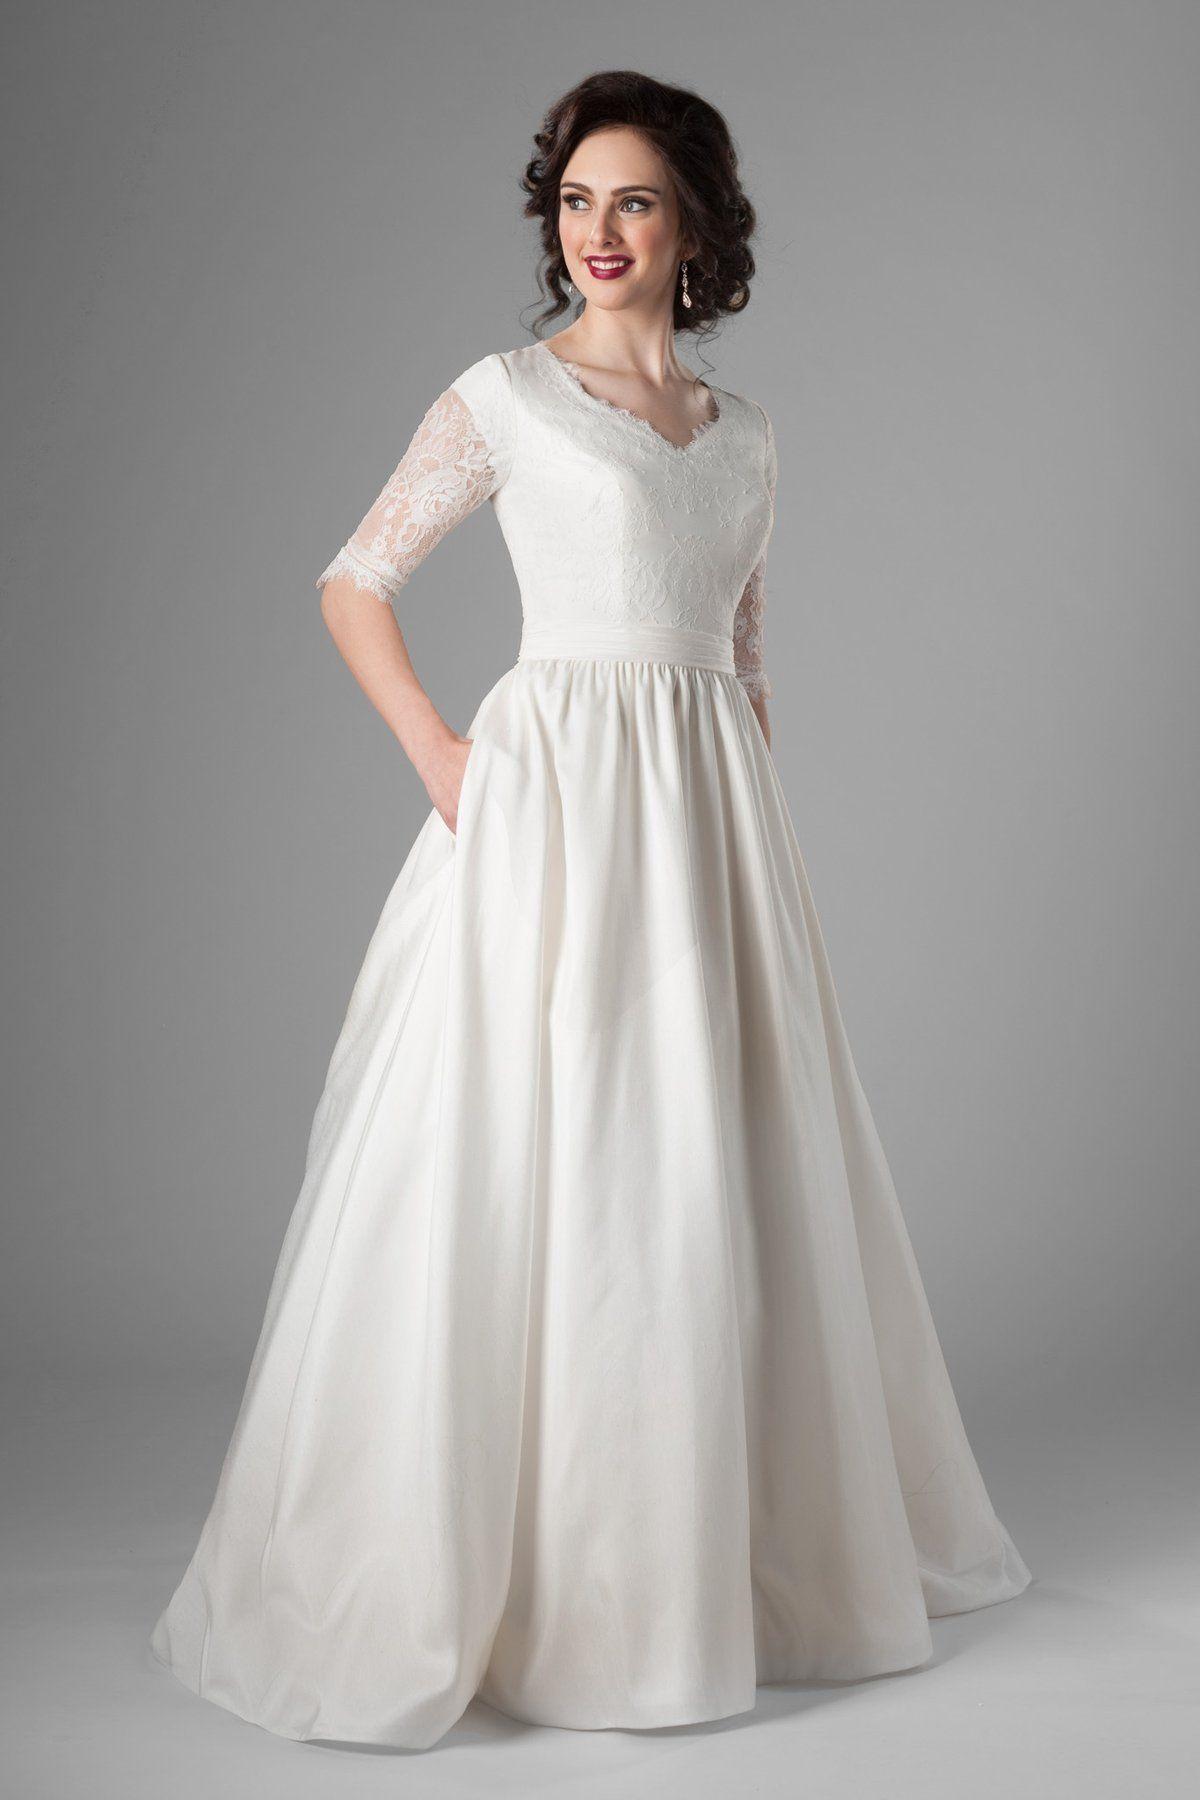 Phillipa Casual wedding gowns, Modest wedding dresses